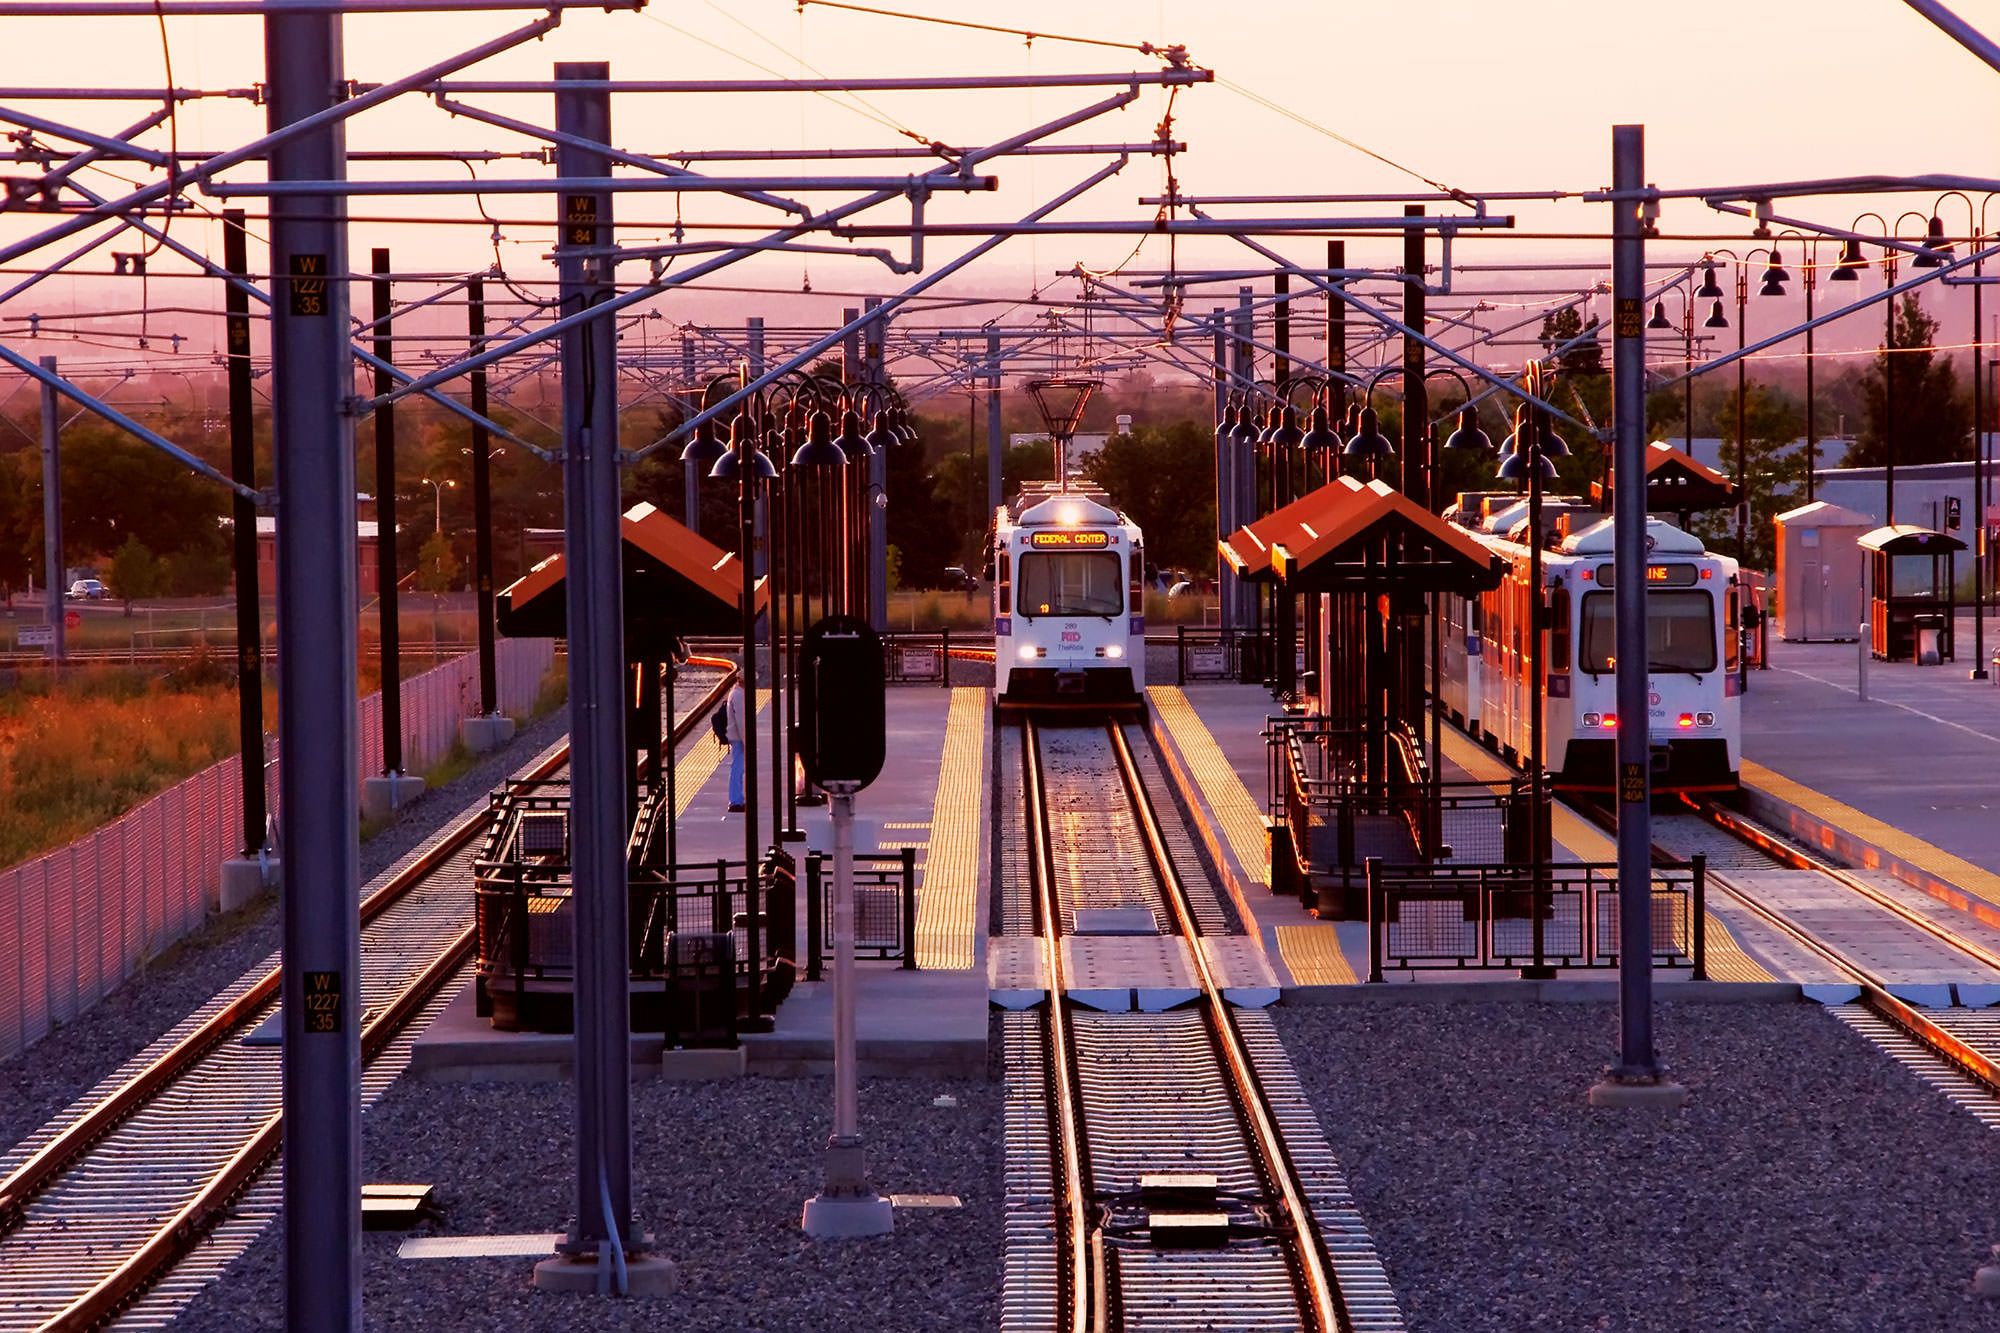 FasTracks West Rail Line Corridor, LRT Extension Final Design